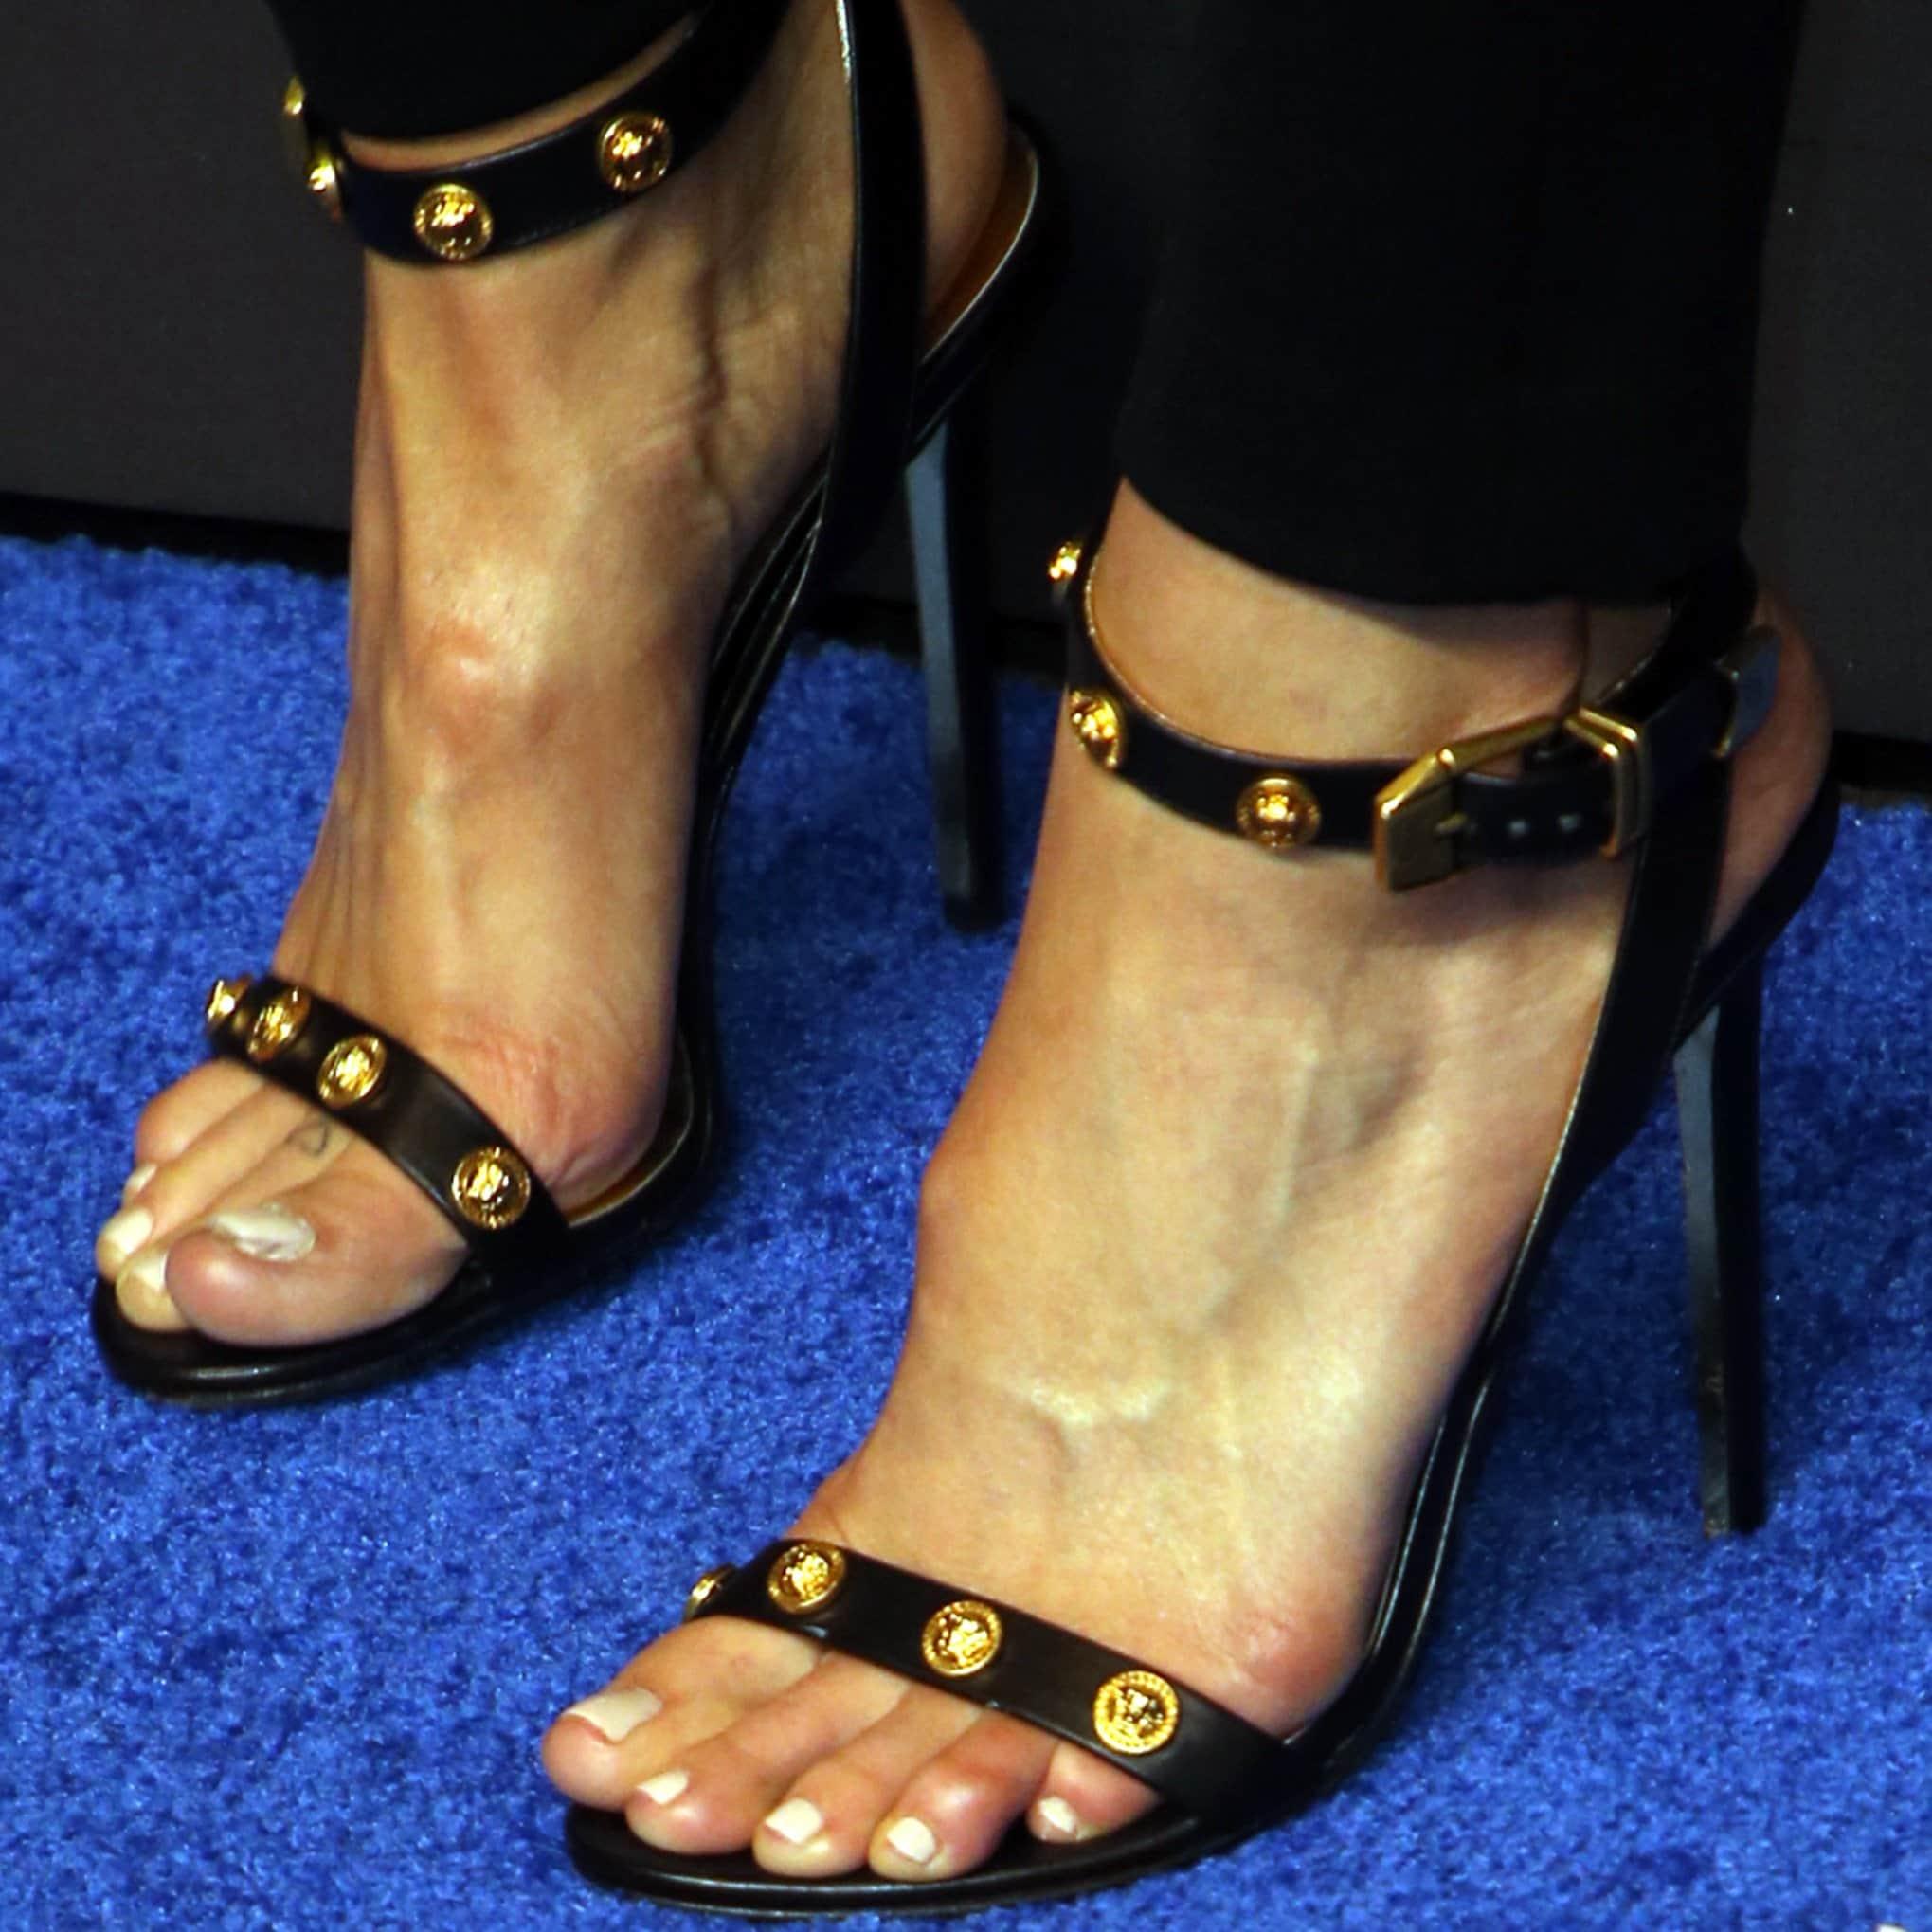 Mandy Moore's size 10 feet in Versace heels